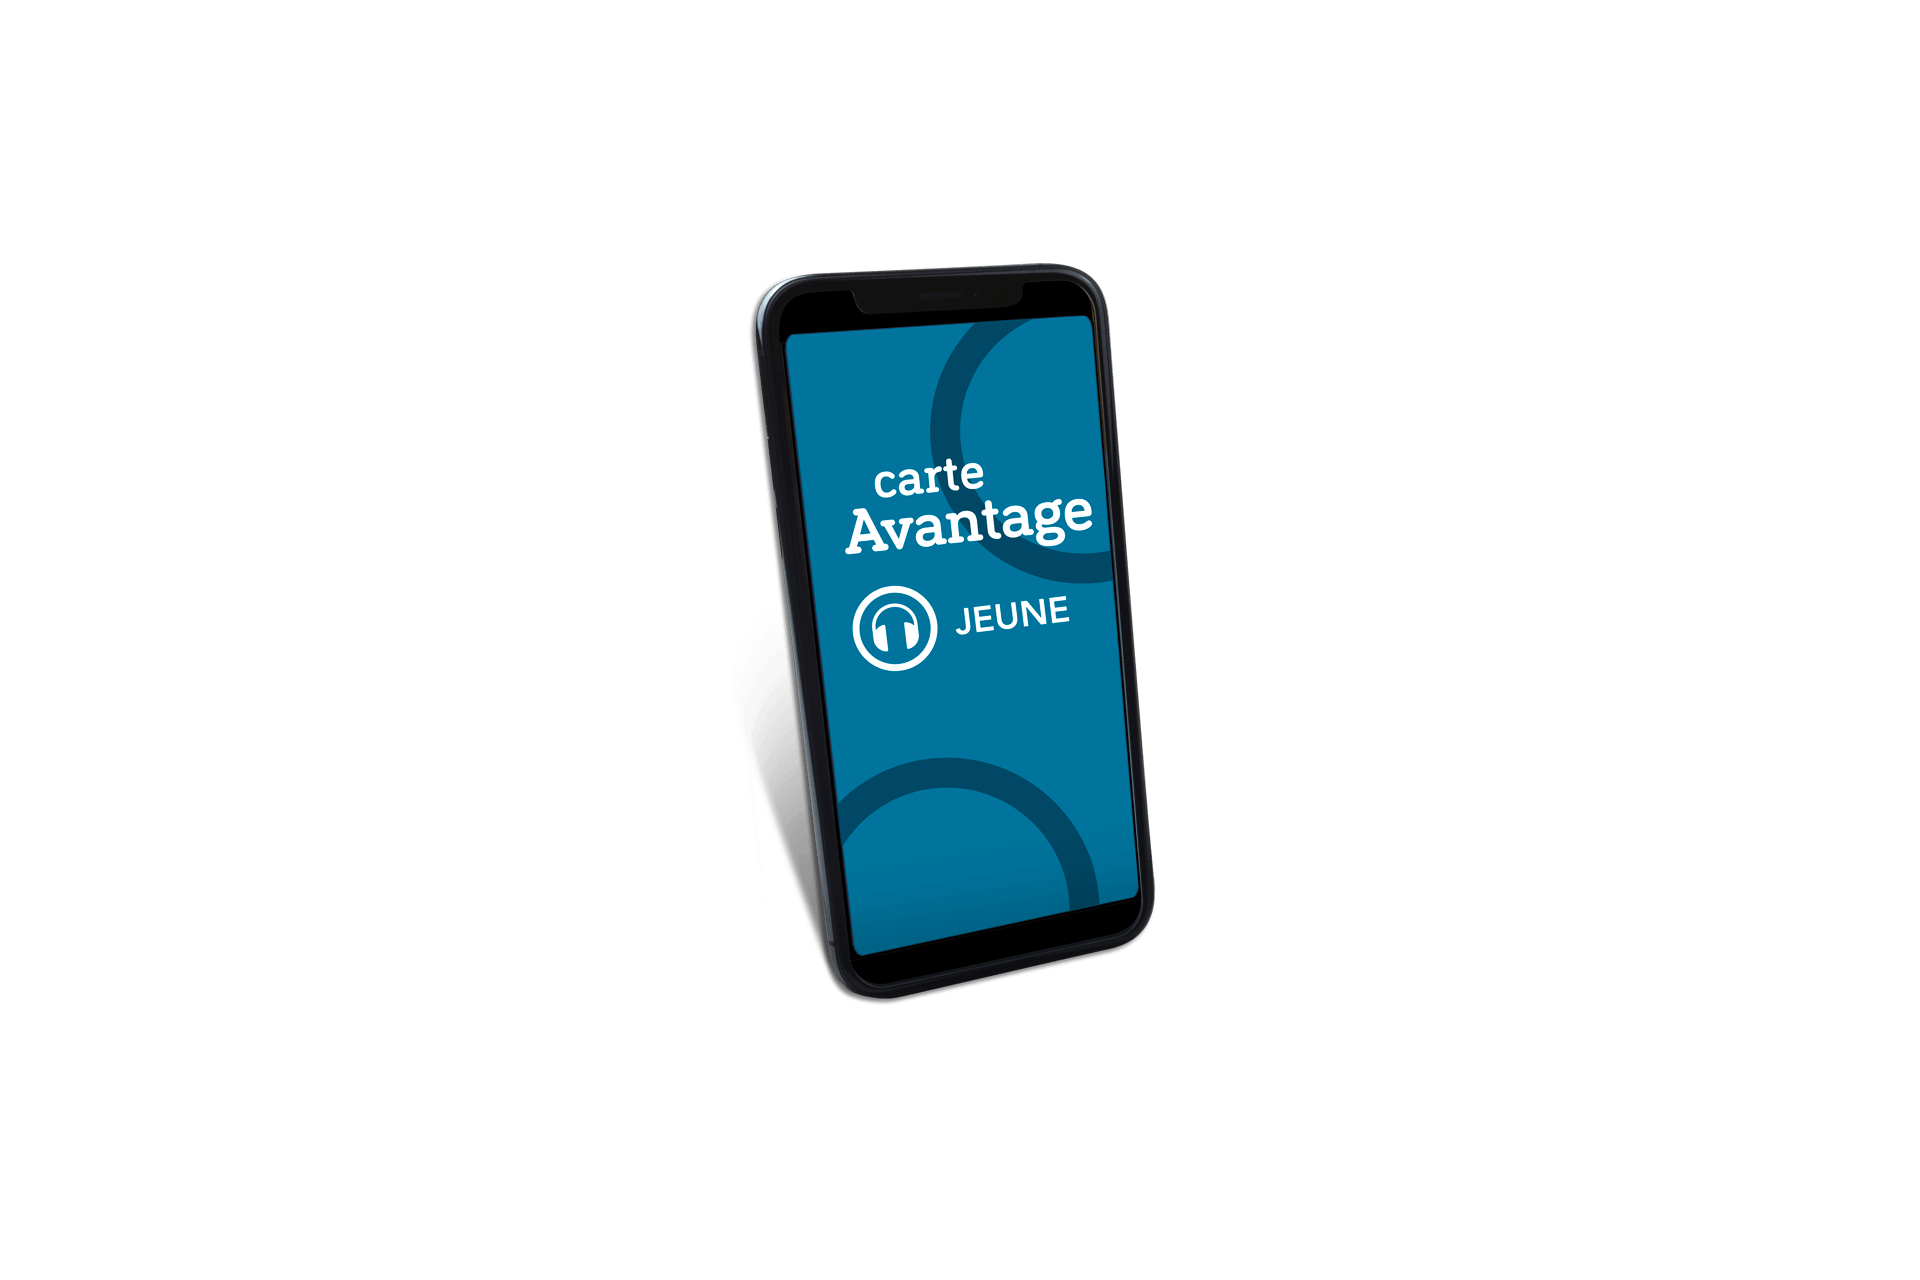 avantage carte jeune sncf Save on travel with the Avantage Jeune card | SNCF